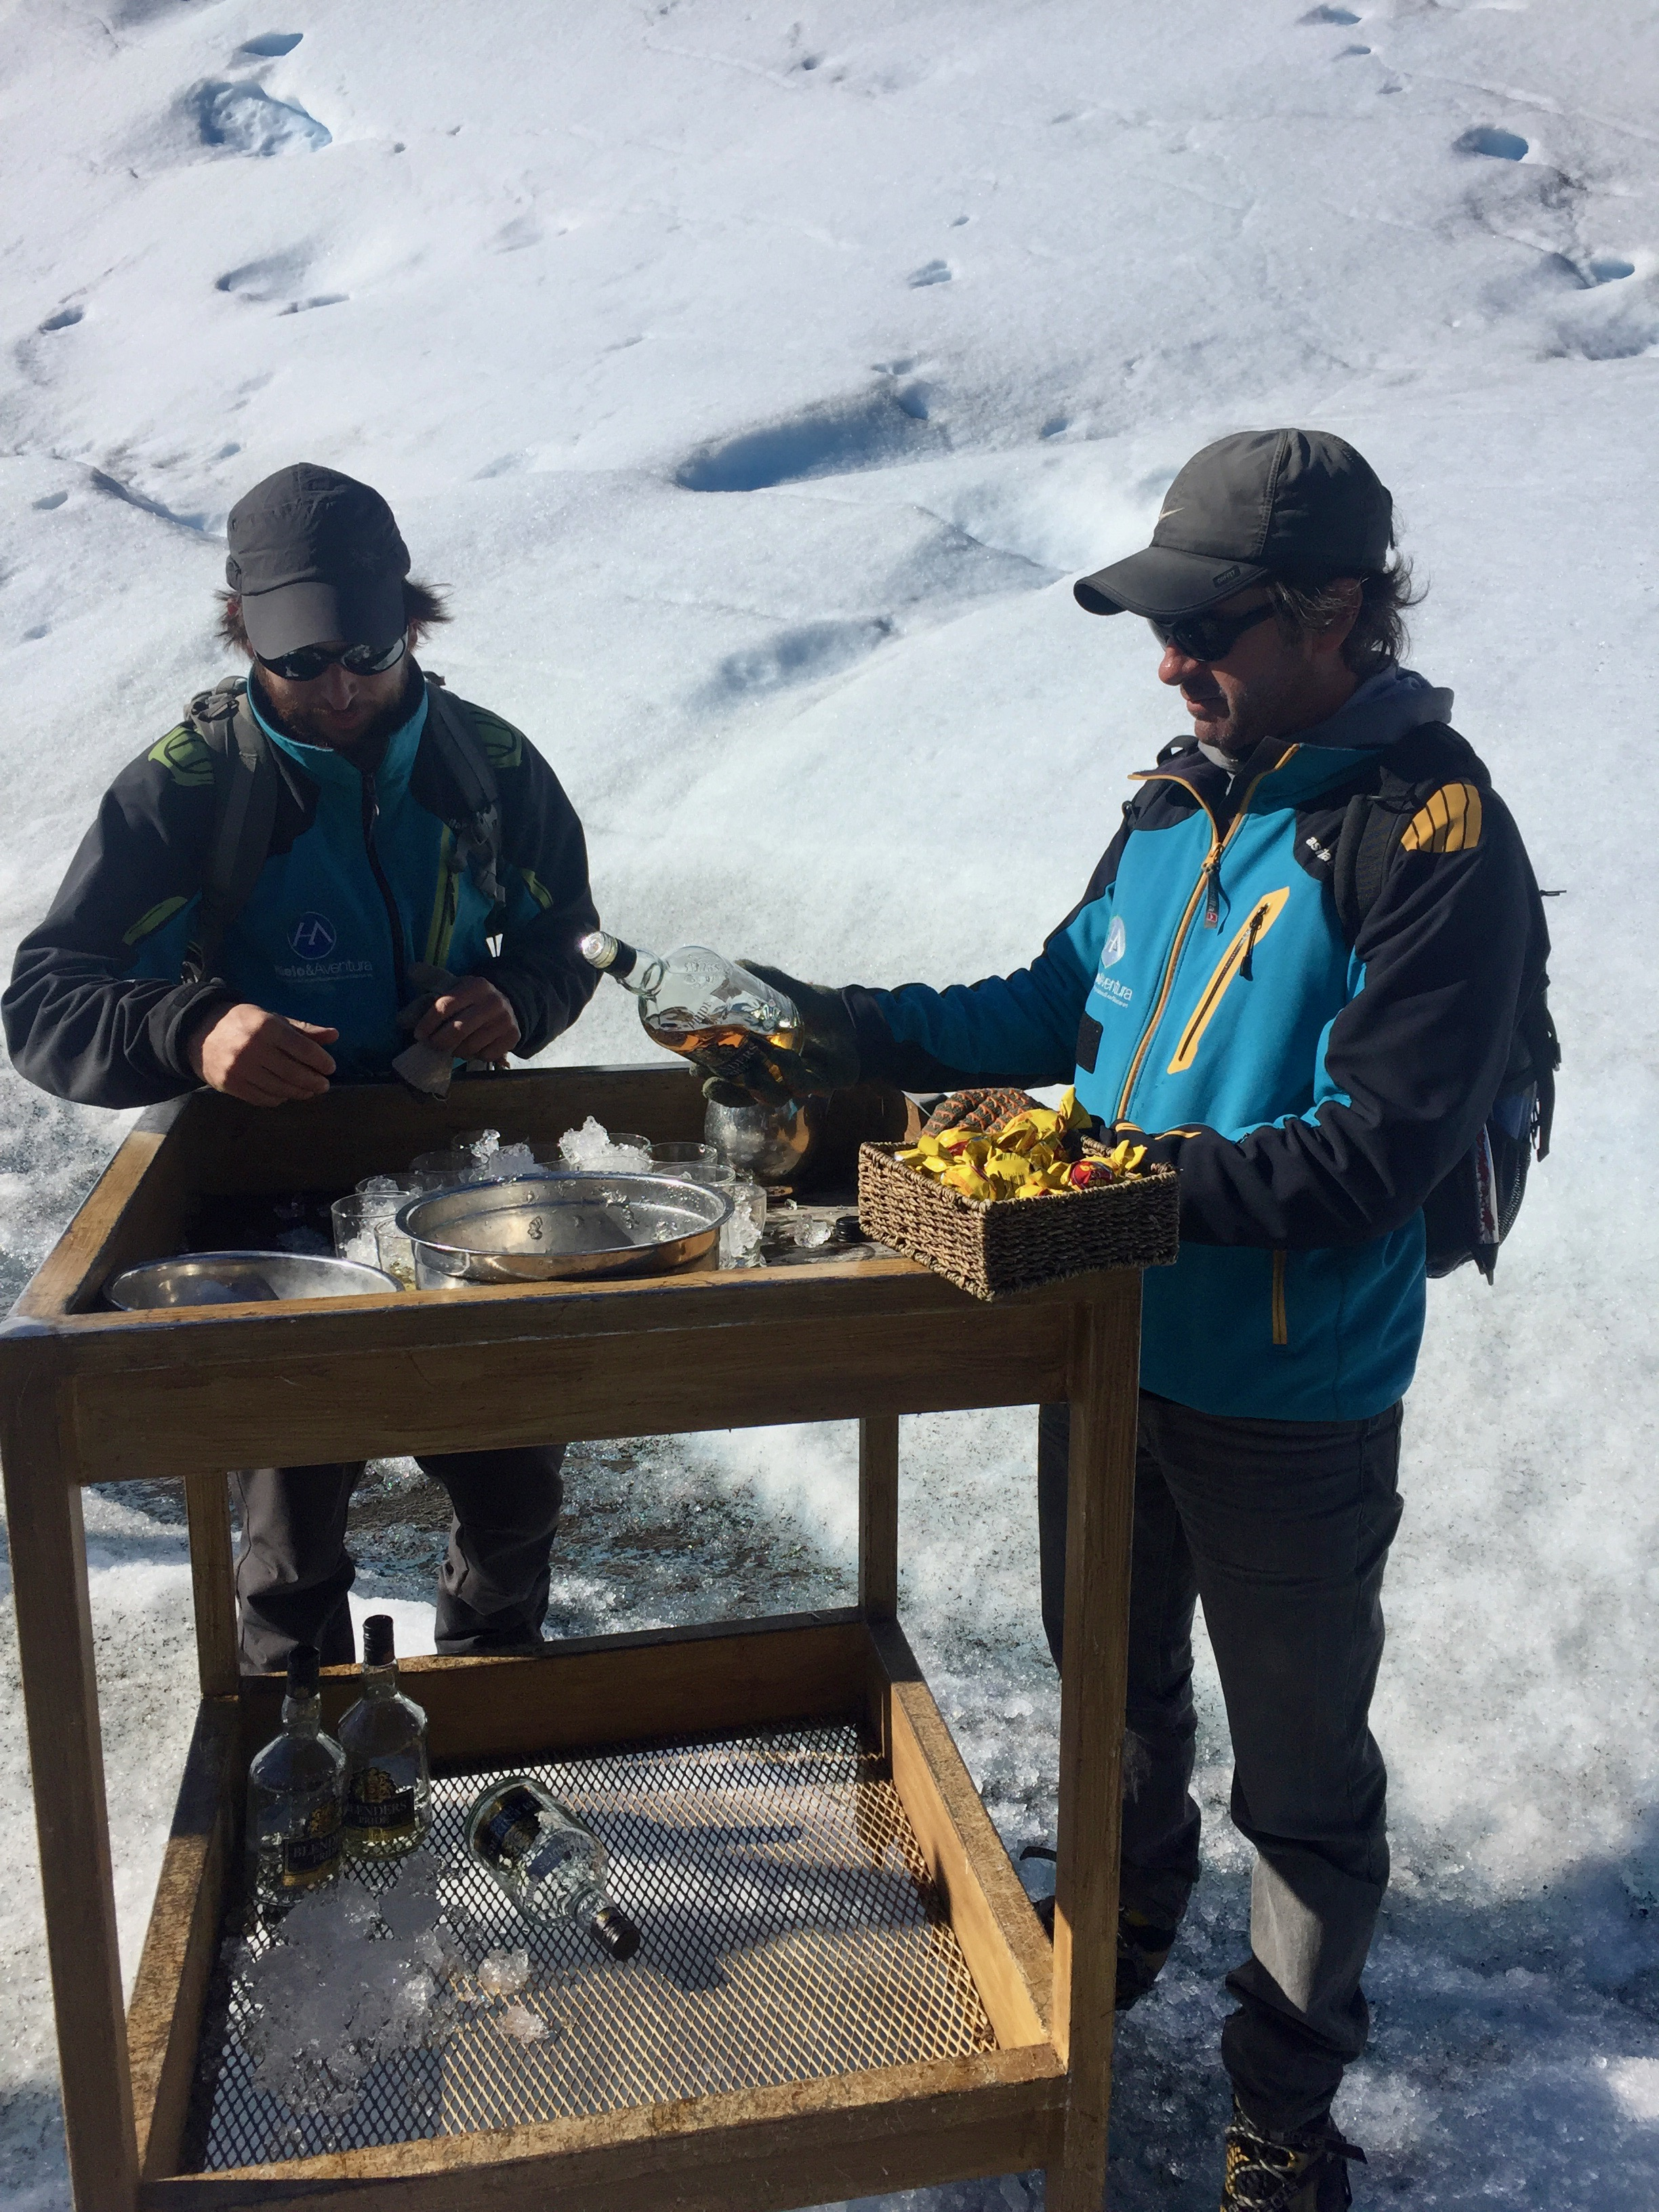 A makeshift bar at the base of a glacier. Salud!